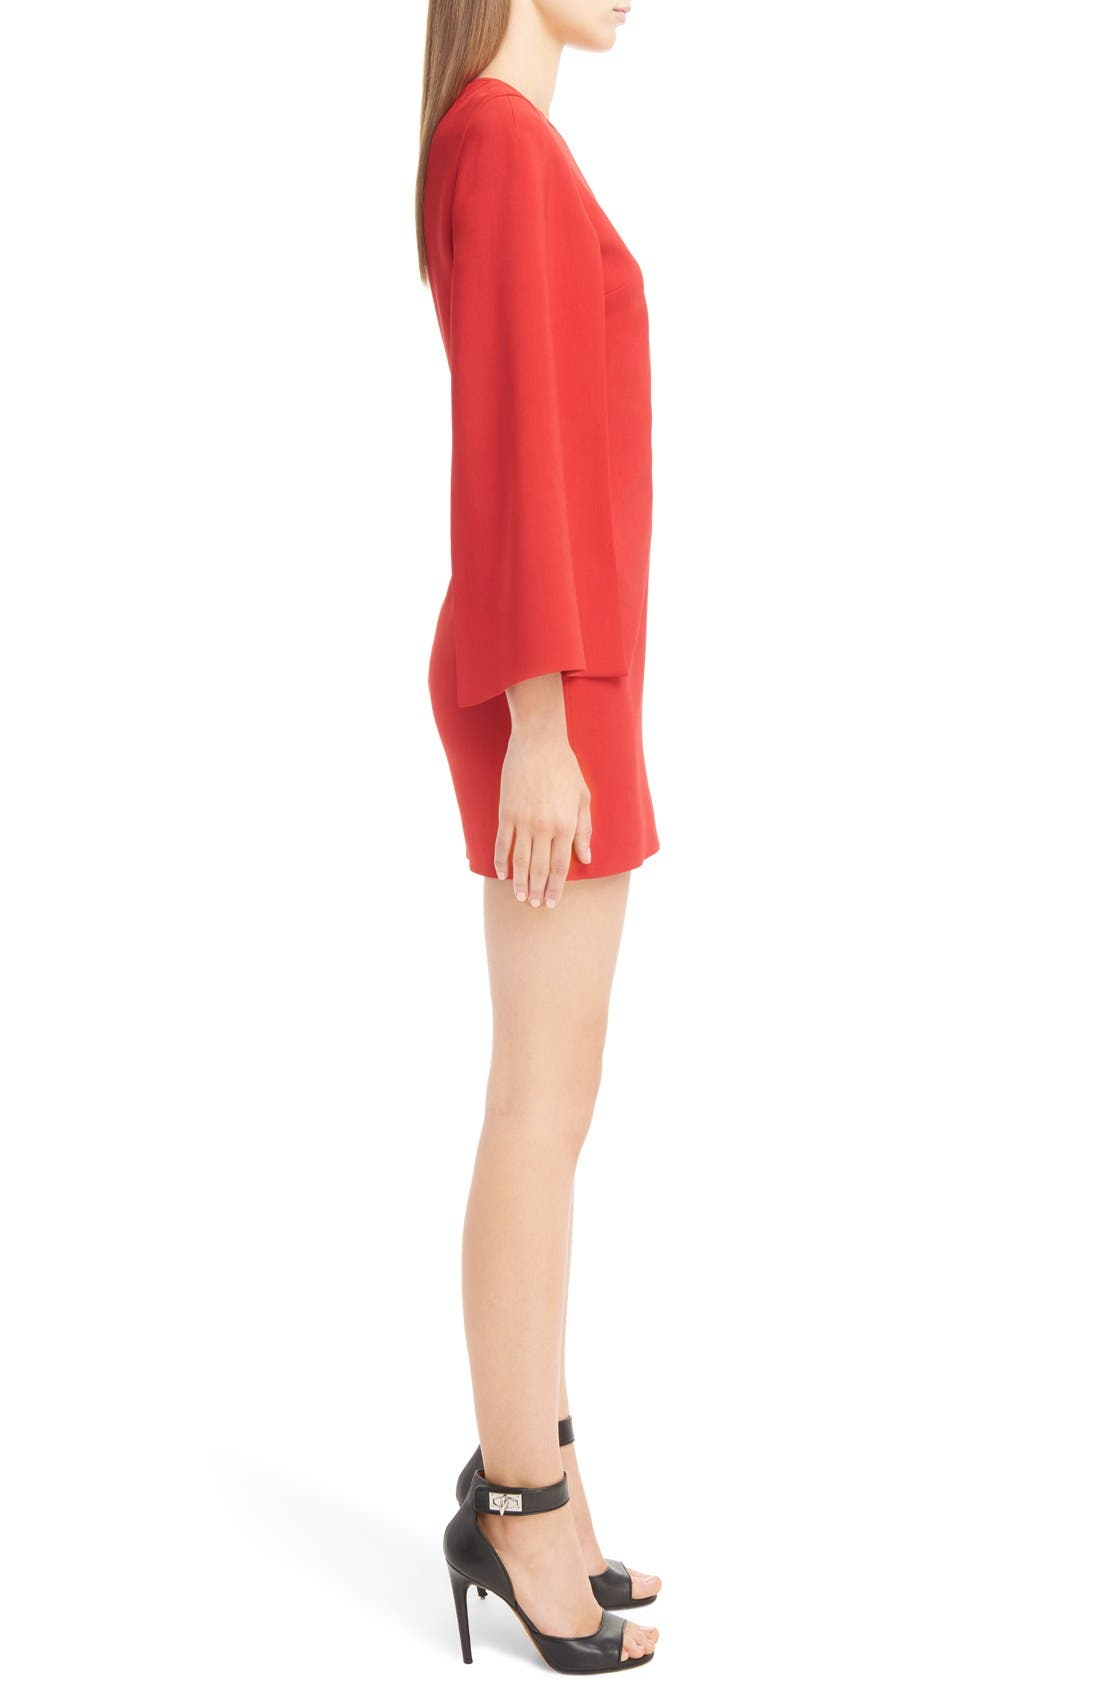 GIVENCHY,                             Cape Sleeve Dress,                             Alternate thumbnail 4, color,                             600